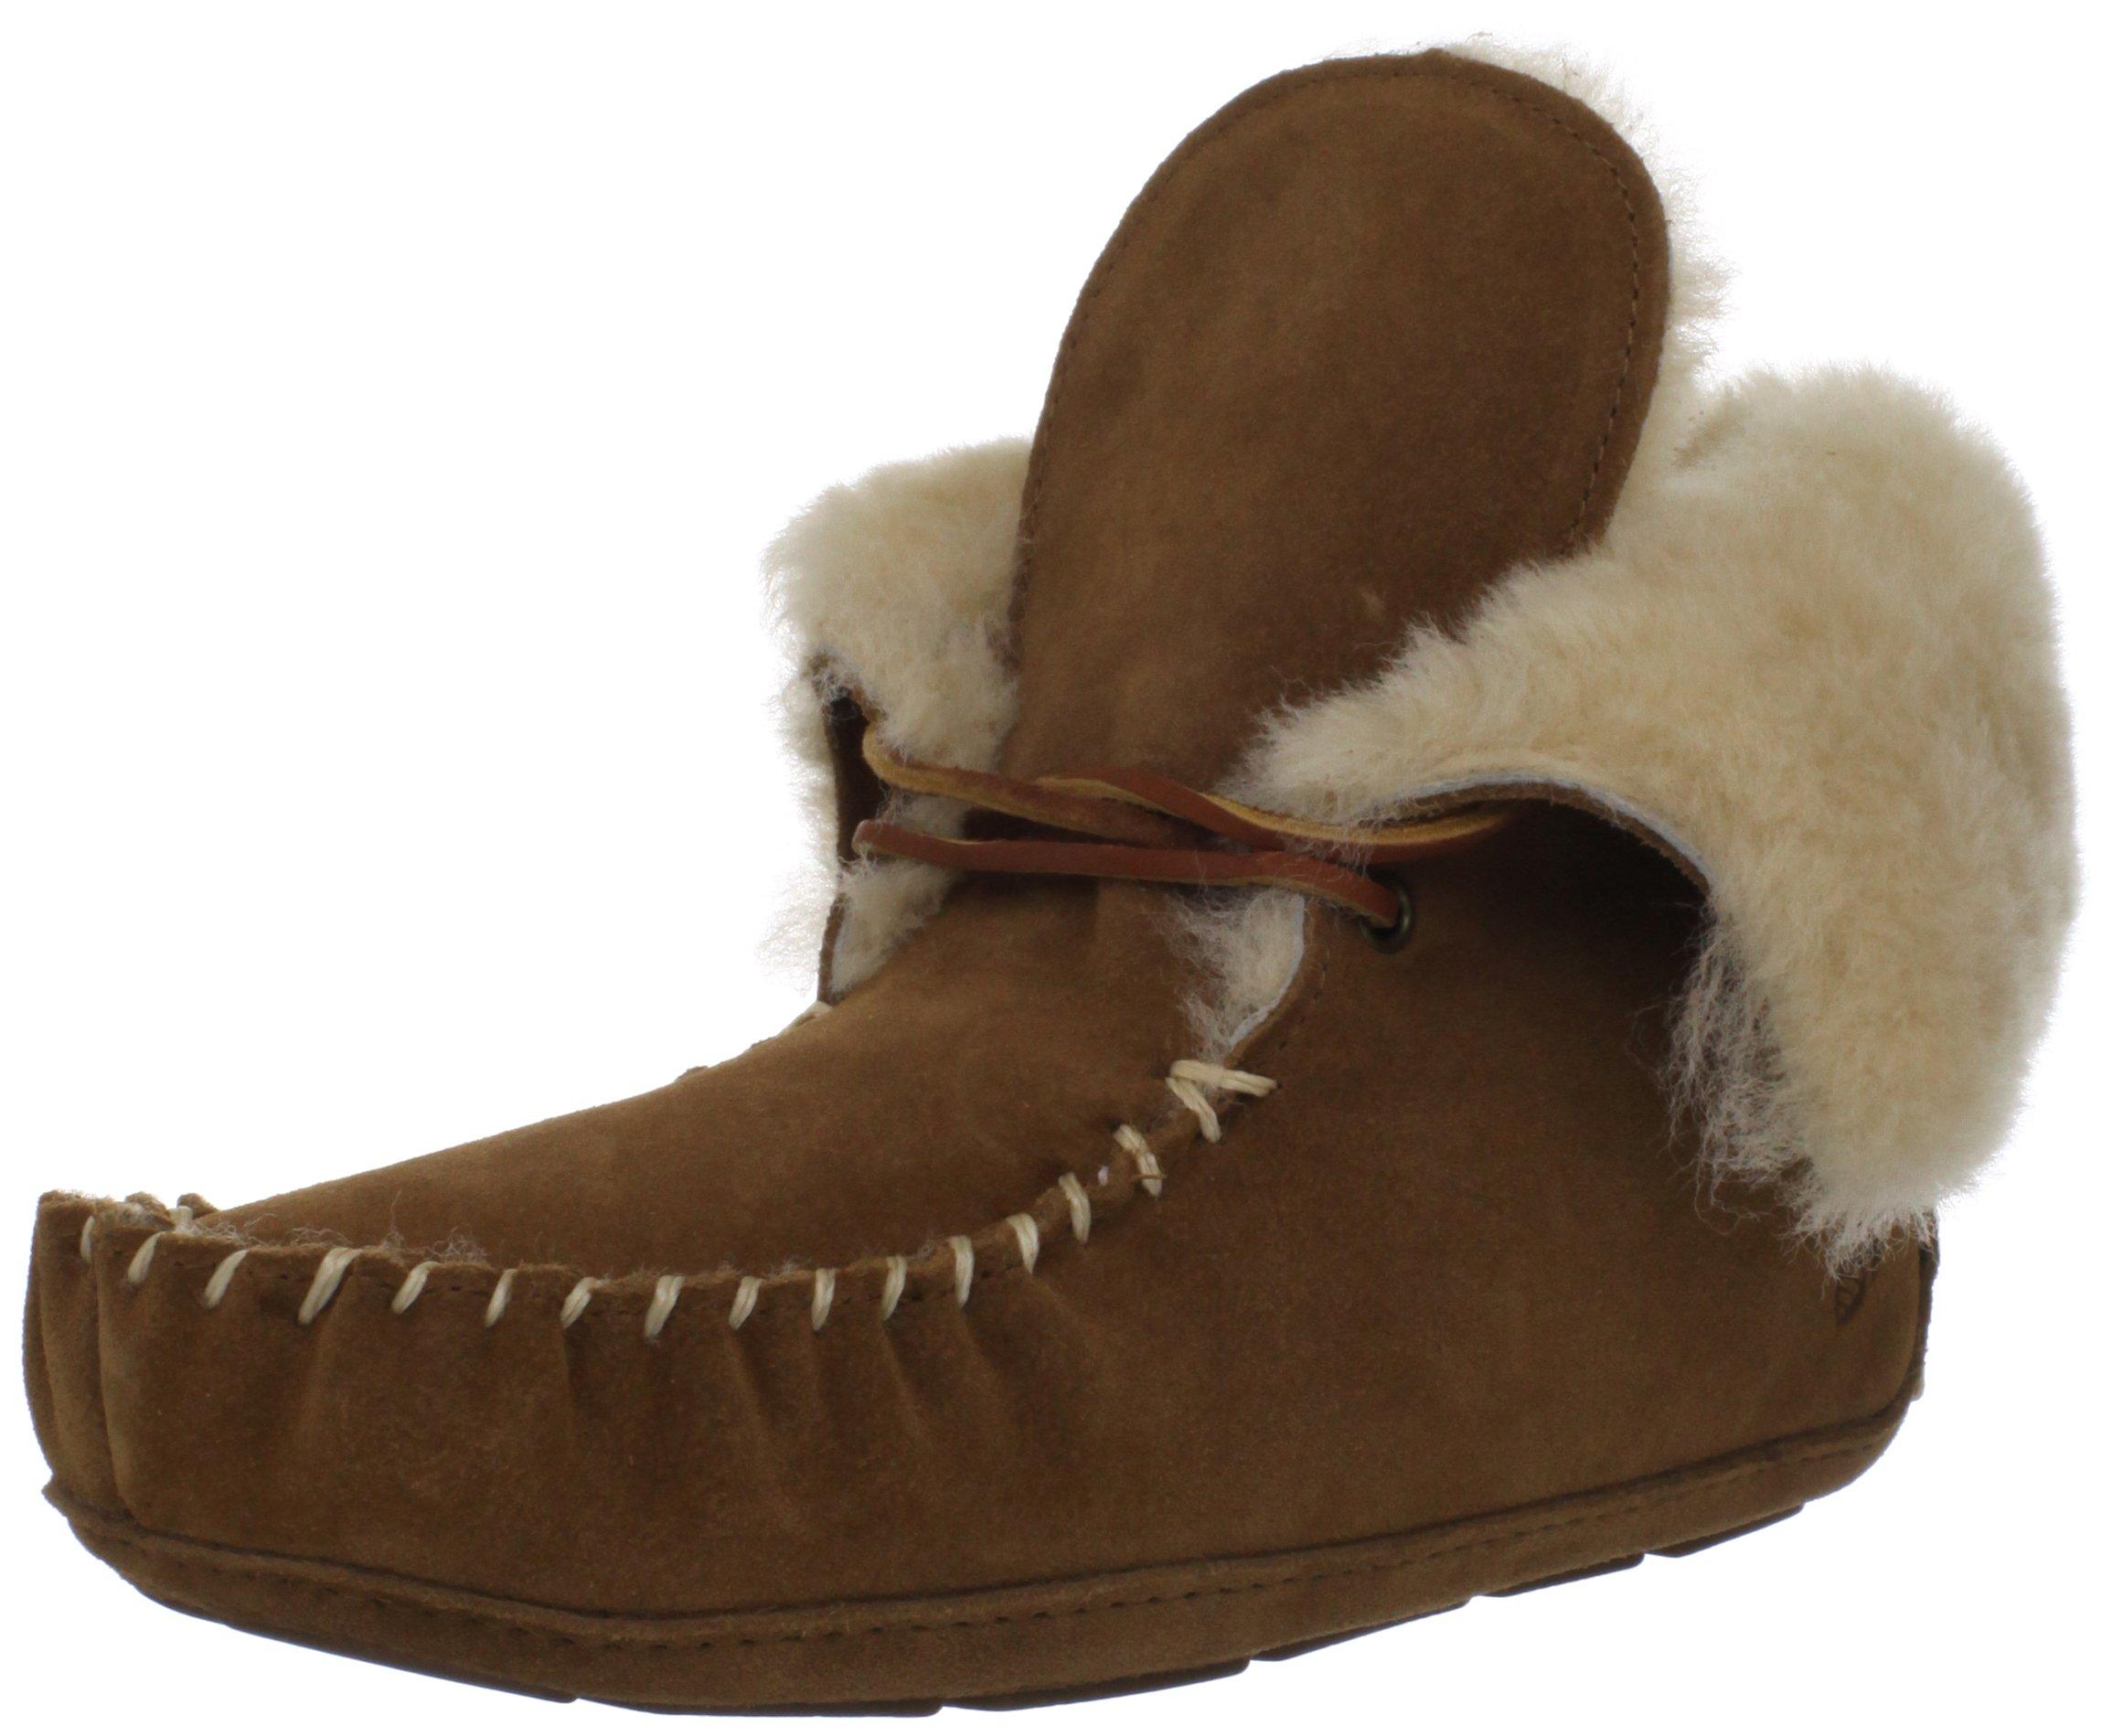 ACORN Women's Sheepskin Moxie Bootie Slipper,Chestnut,9 M US